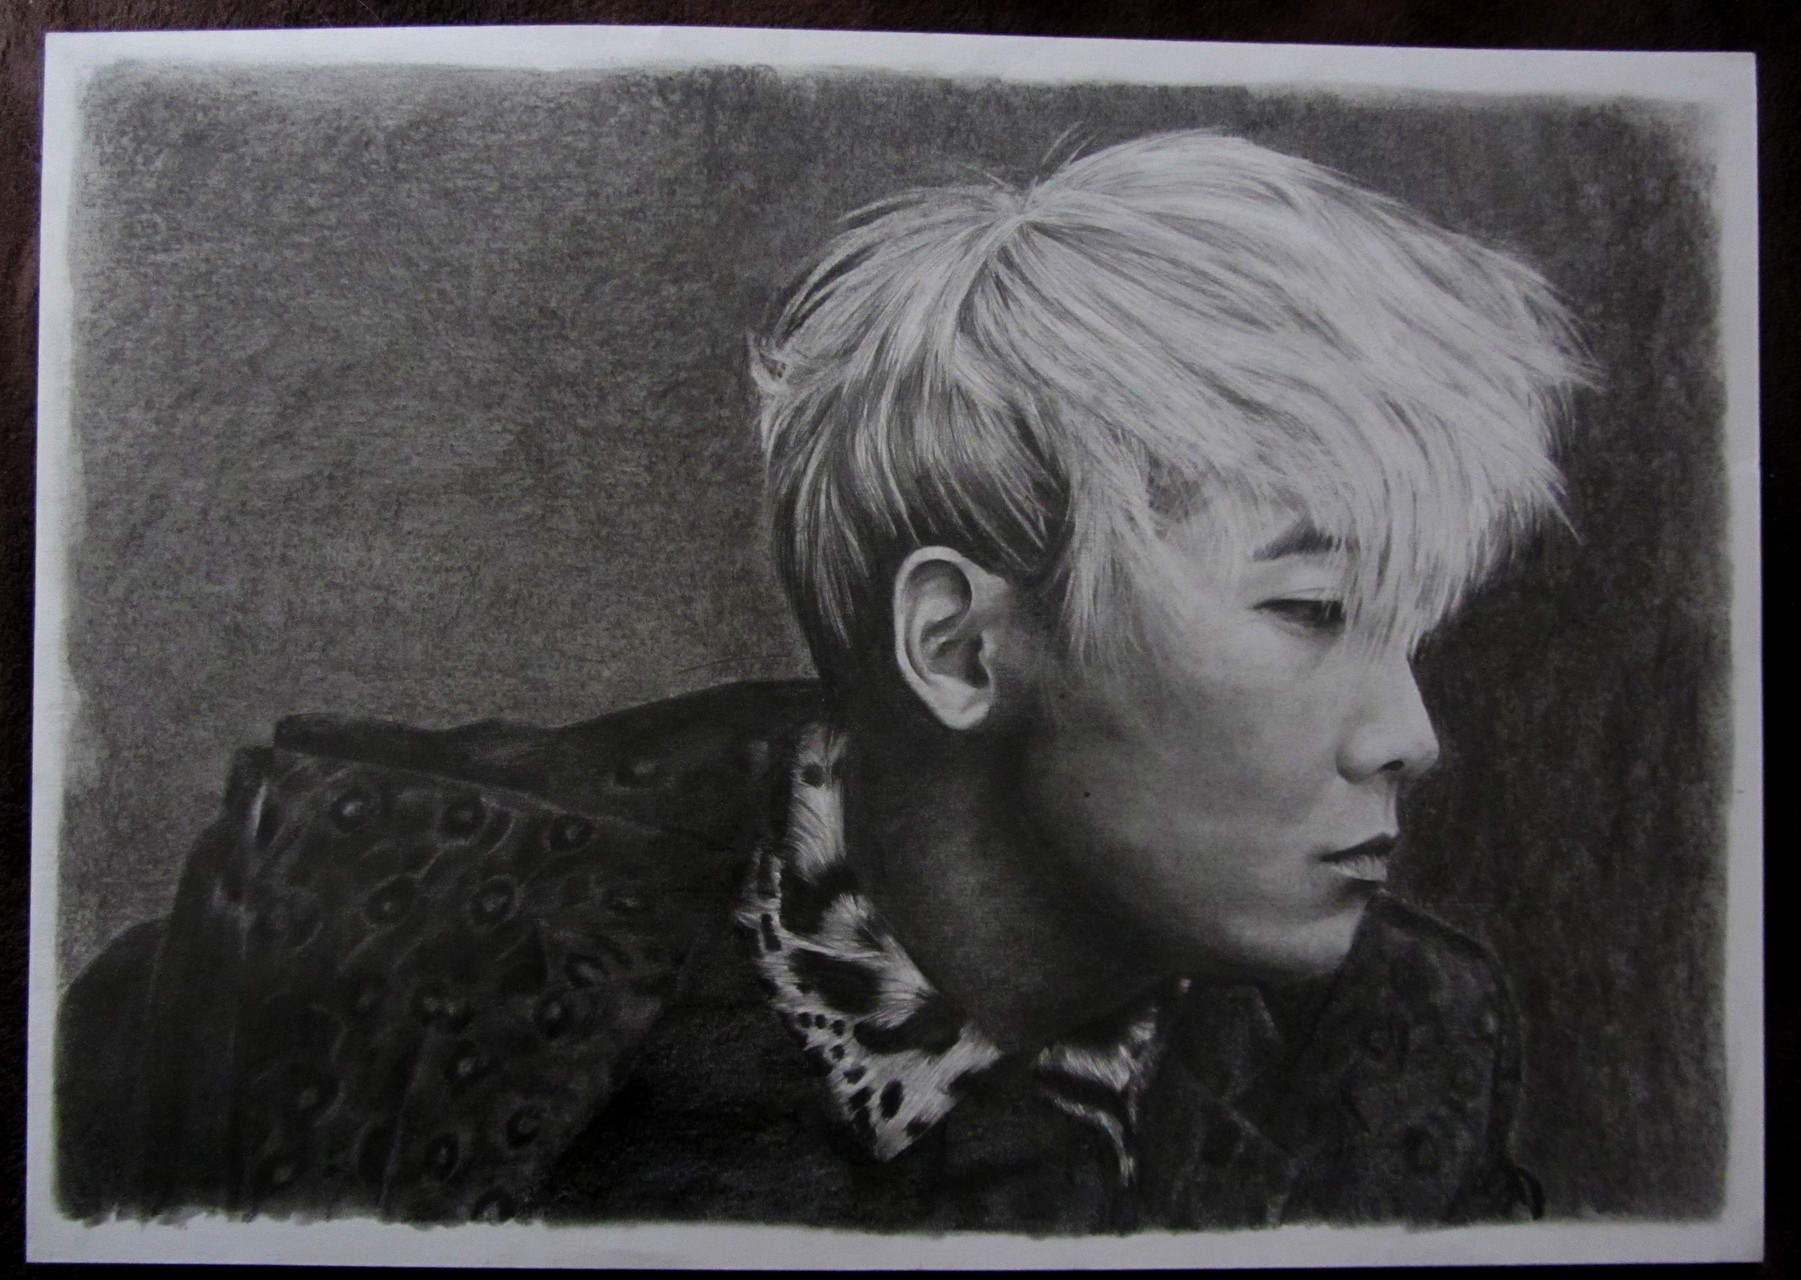 Lee Hong Ki (FT Island) - A3 - Crayon & Fusain